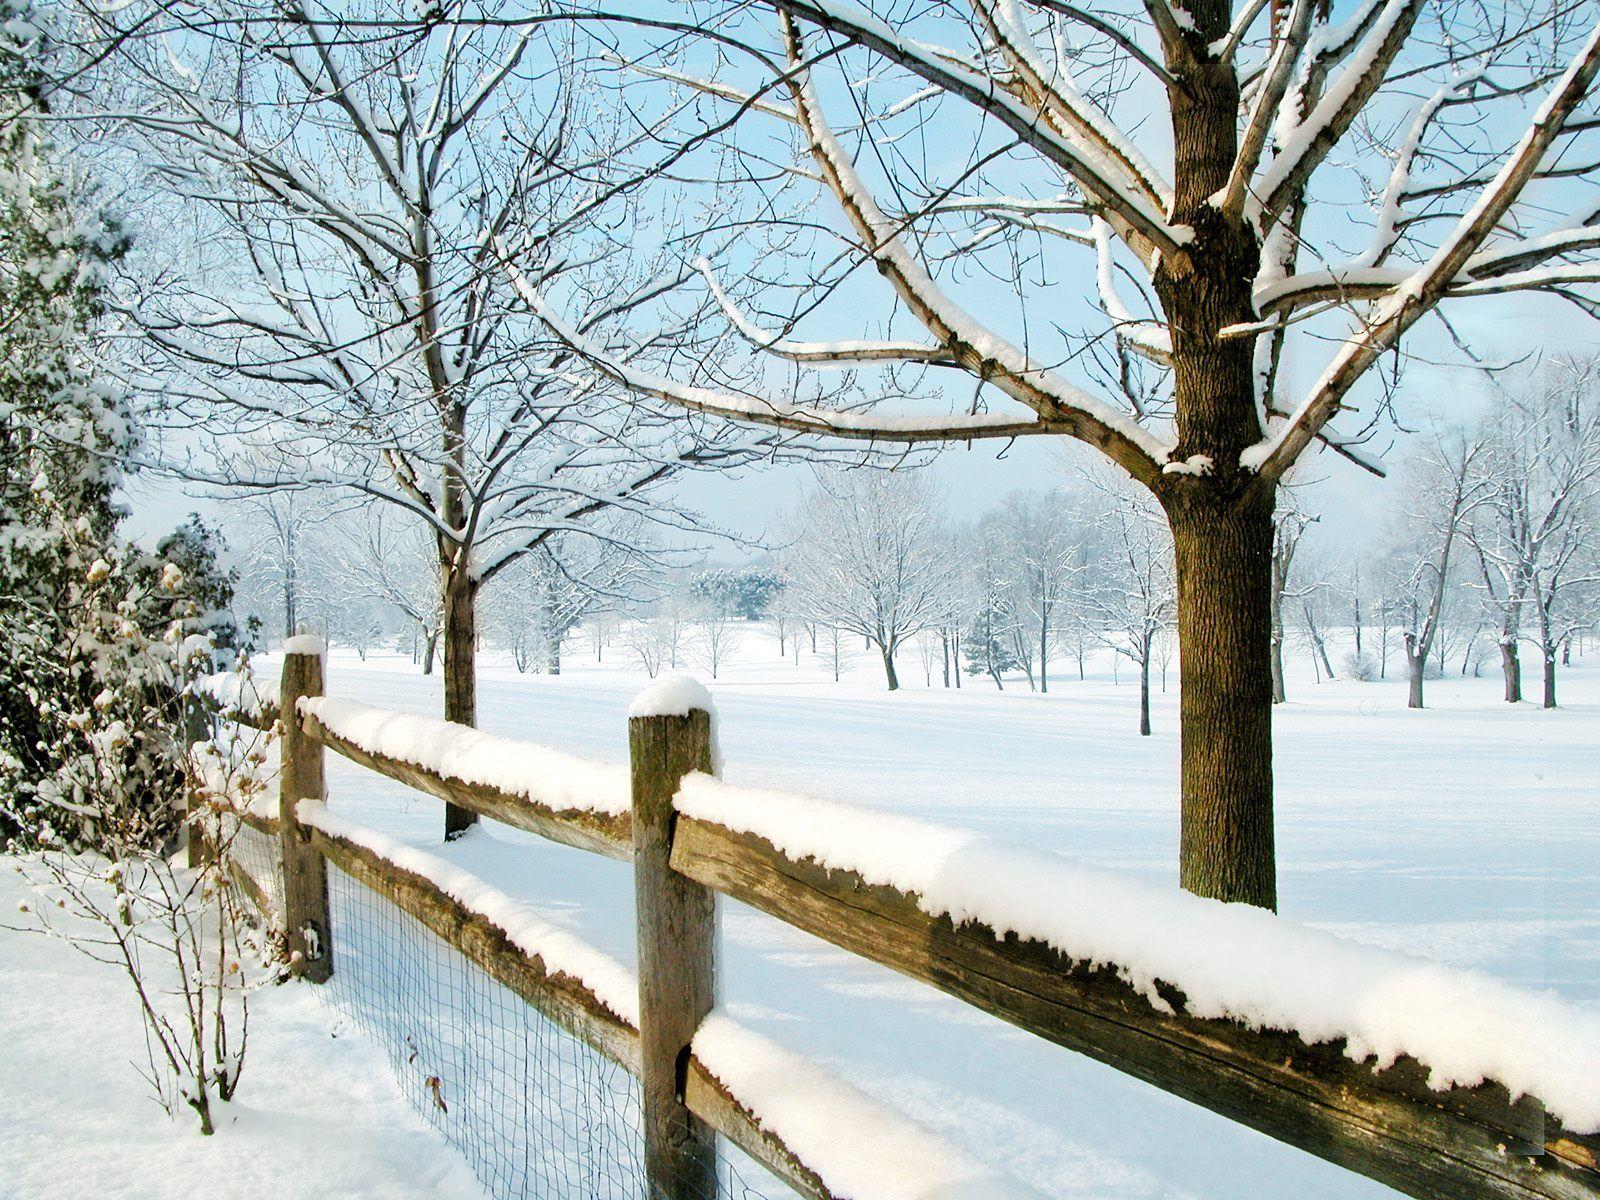 Winter scenes backgrounds - SF Wallpaper